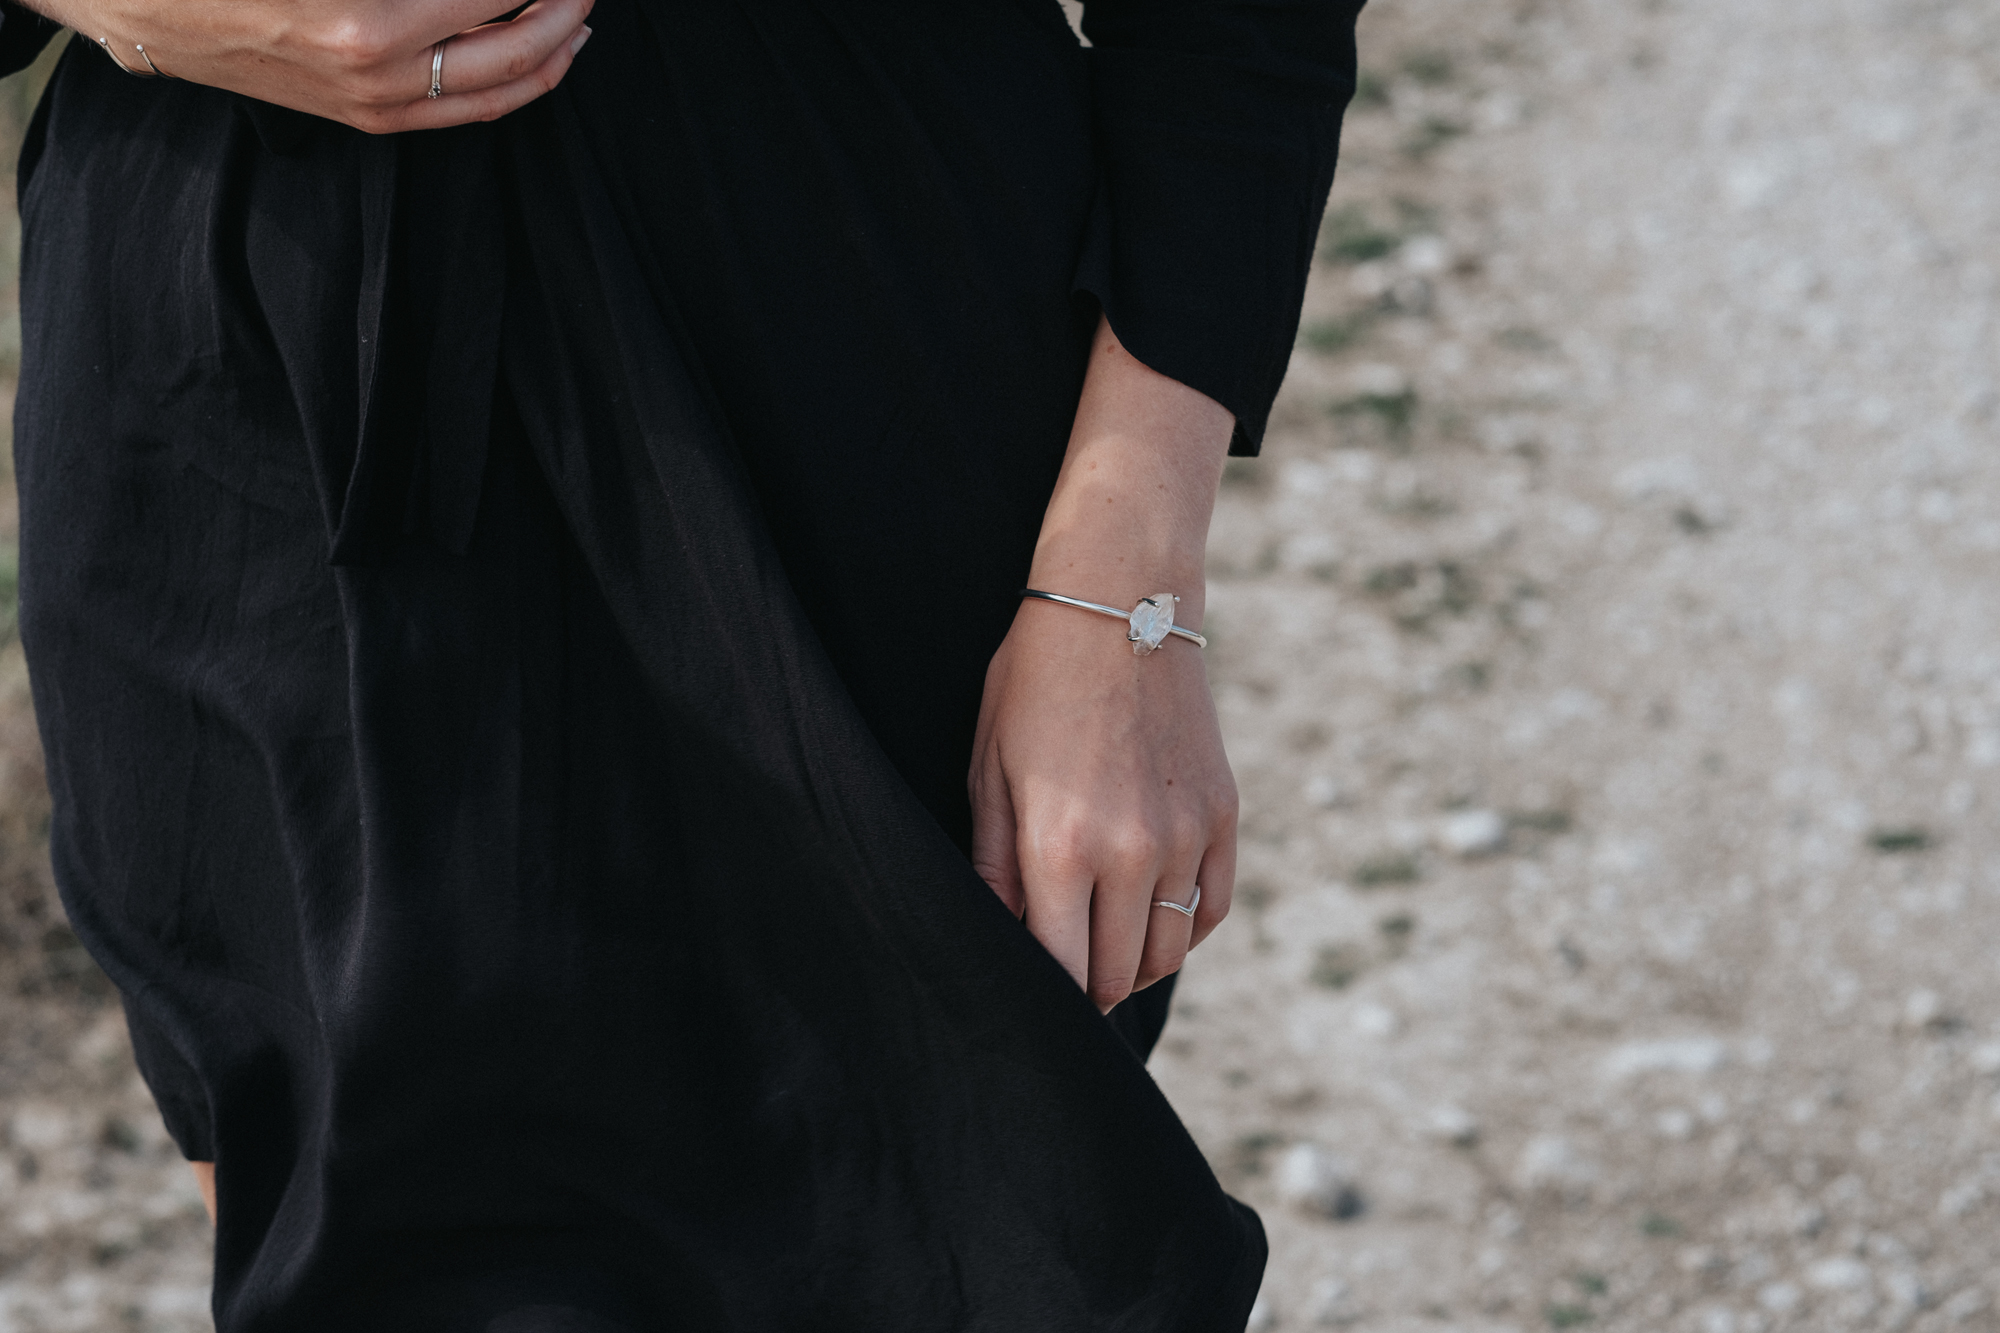 002-företagsfoto-gotland-malin-ivarsson-jewelry-neas-fotografi.jpg